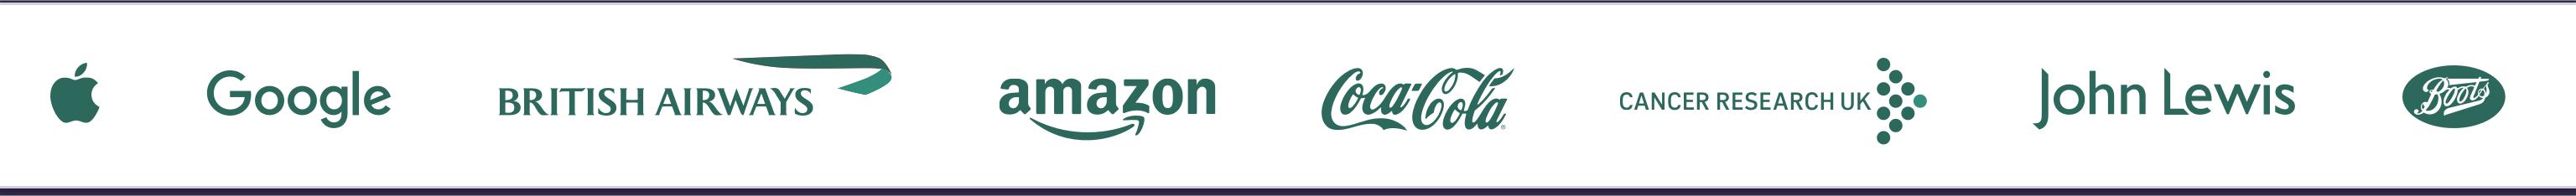 TrustTracker Brands